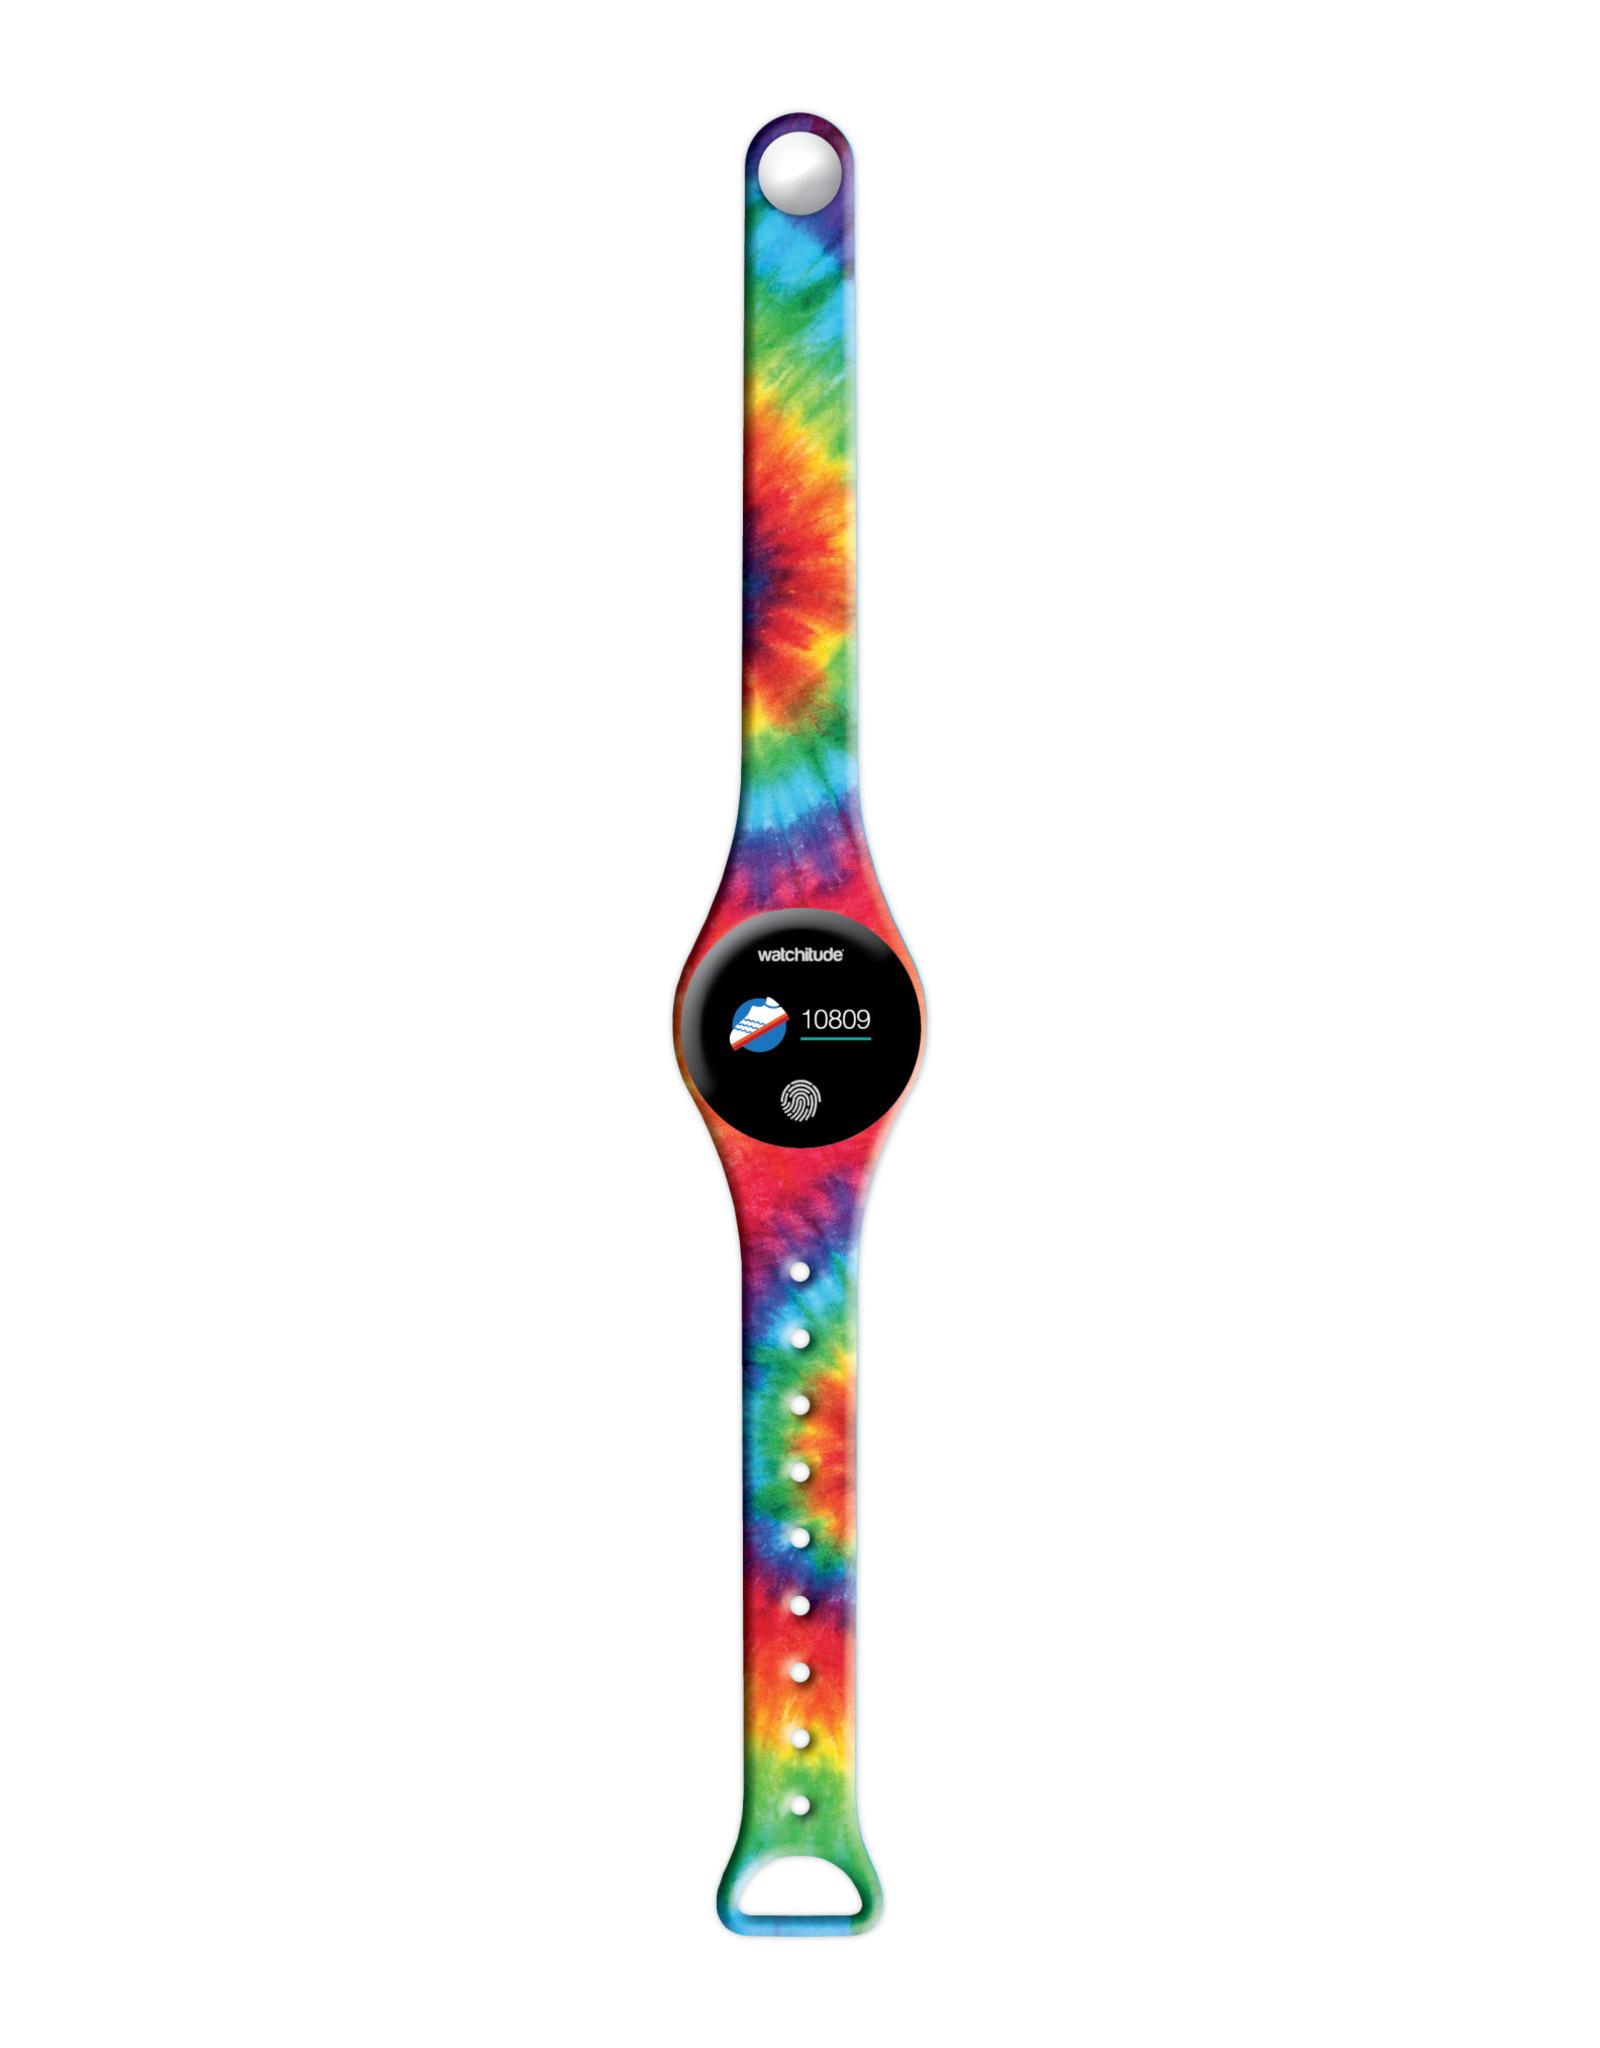 Watchitude Tie Dye - Move 2 - Kids Activity Plunge Proof Watch